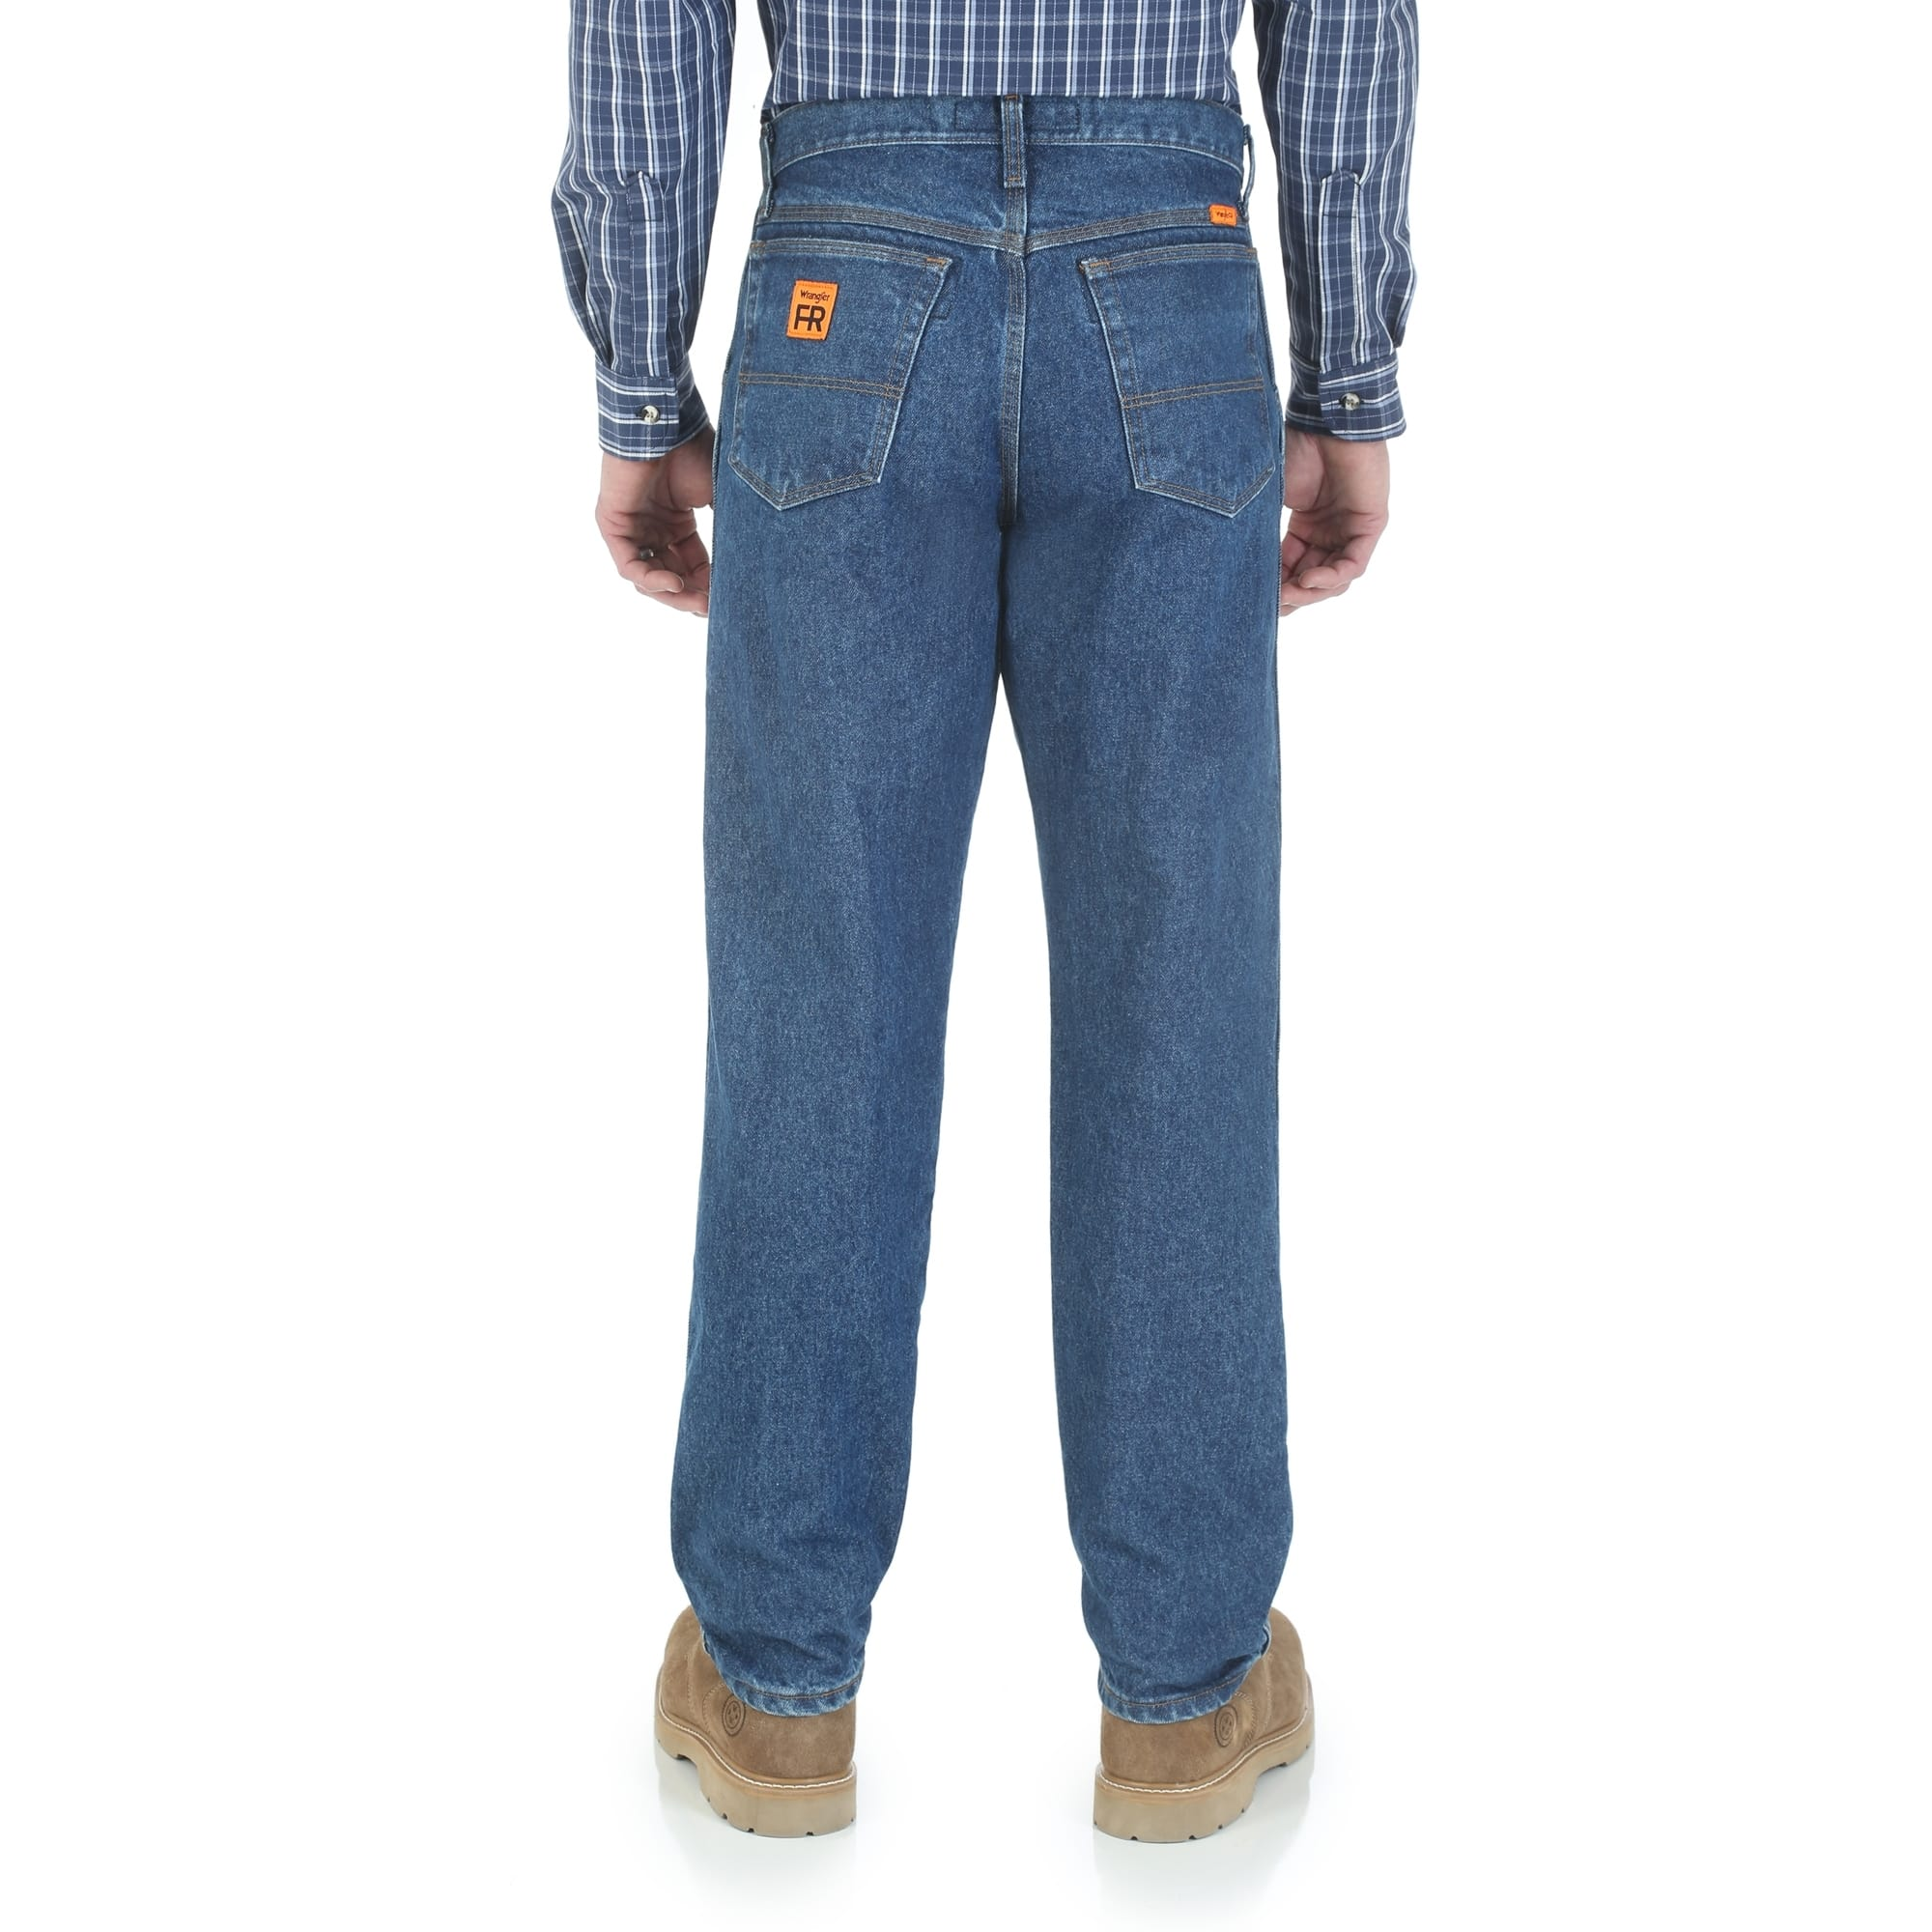 42 X 34 Mens Jeans